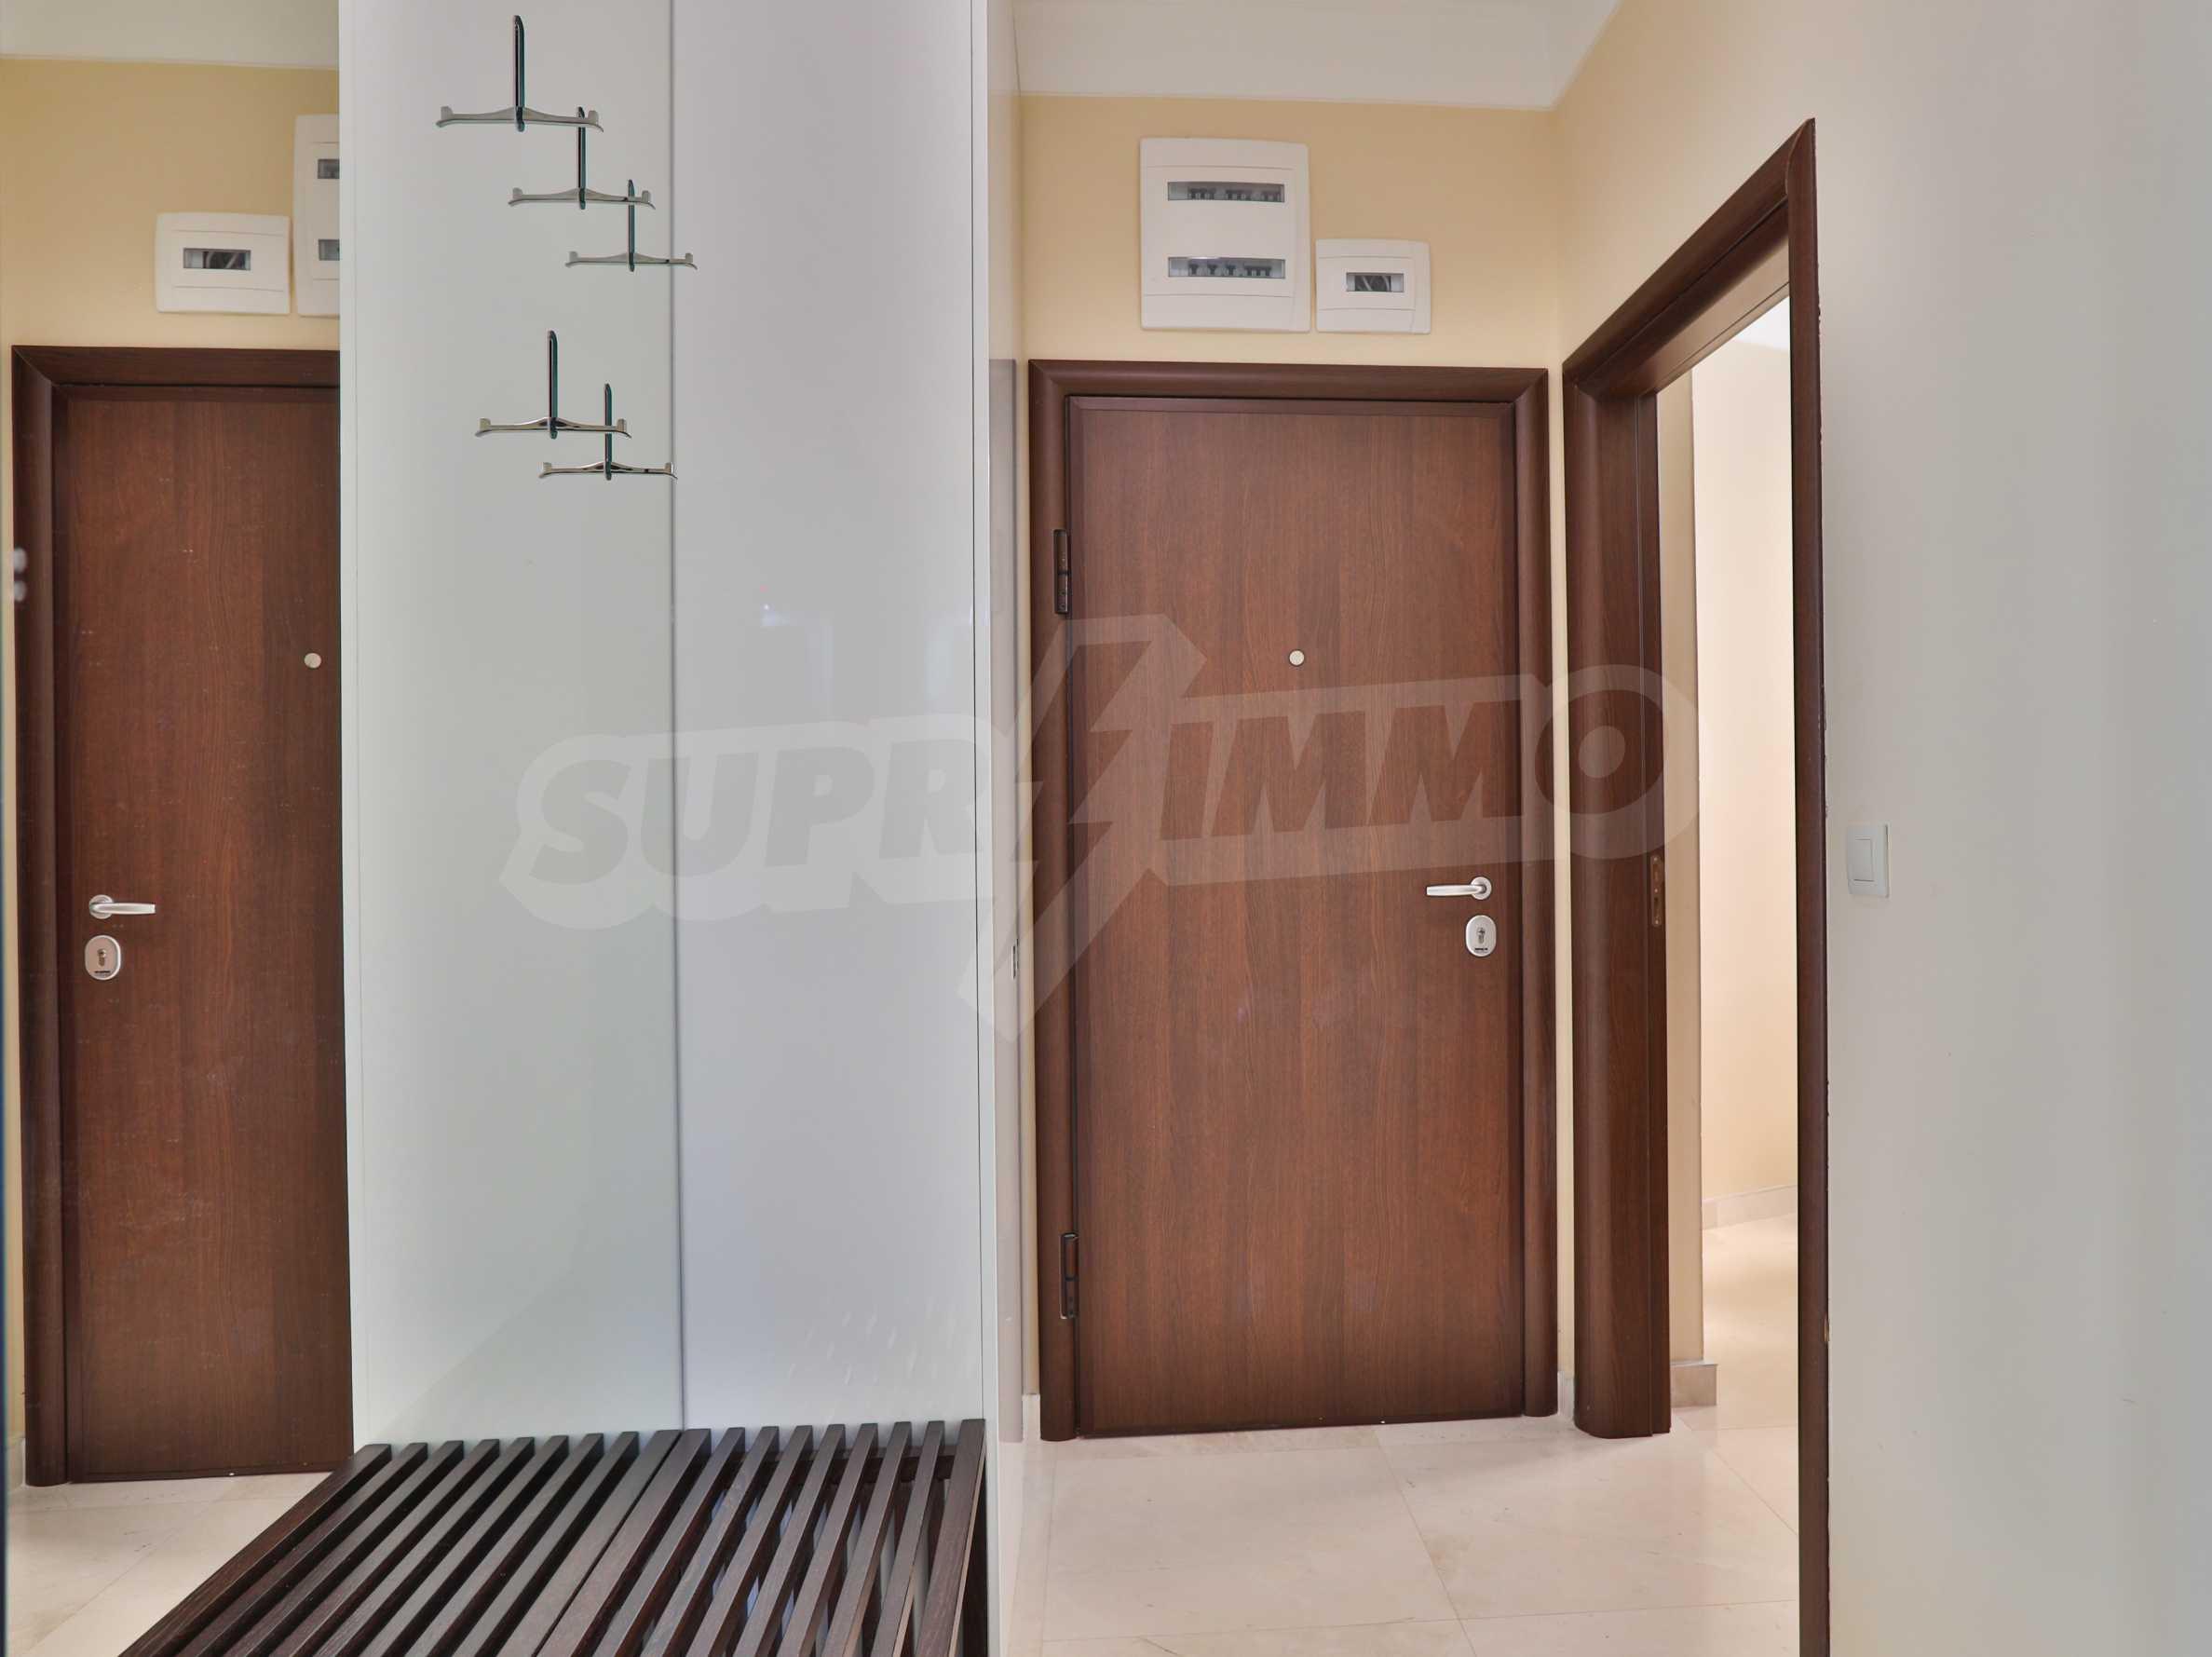 Exclusive 2-bedroom beachfront apartment in the prestigious Belle Époque Beach Residence 26